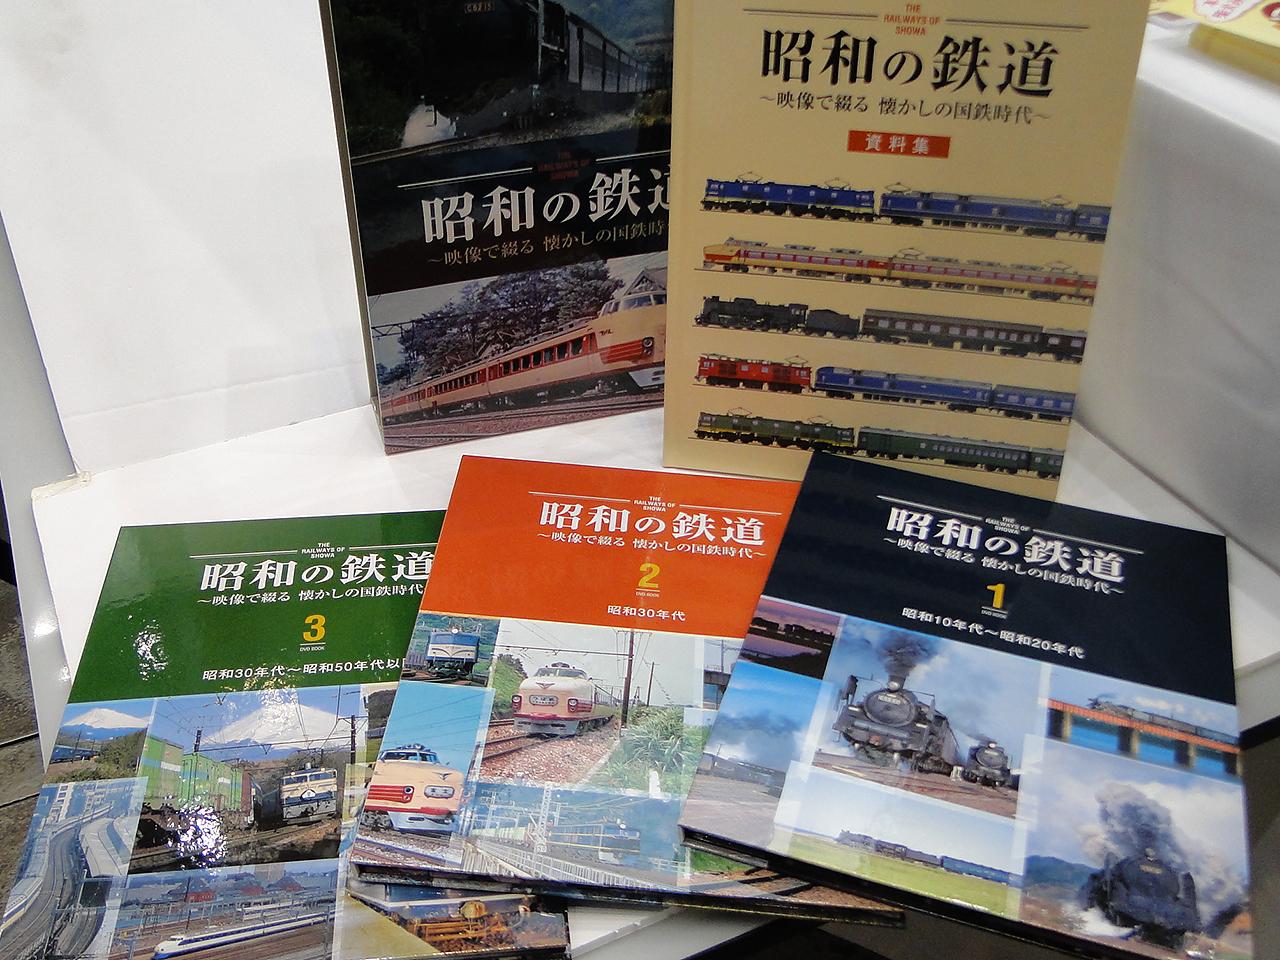 http://moritetsu.info/train/img/DSC09540ss.jpg